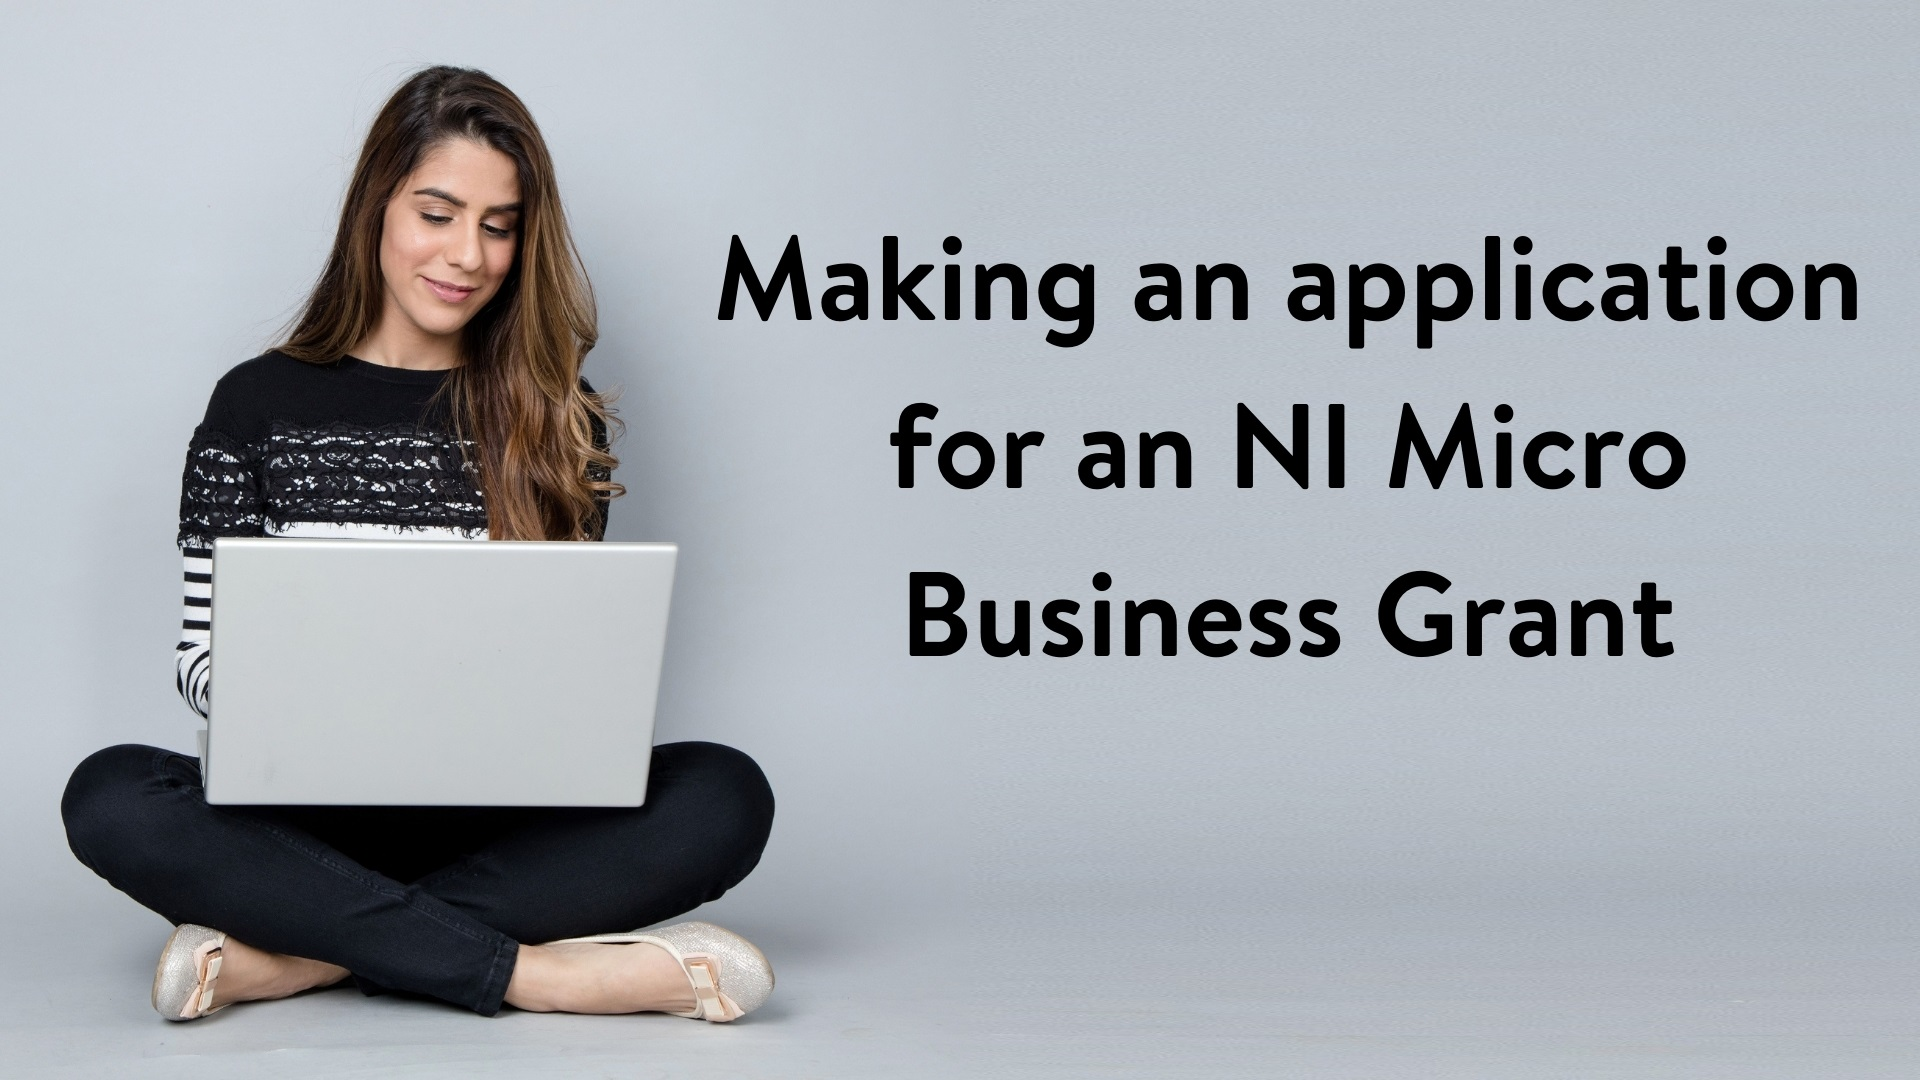 Northern Ireland Business Funding - Web content writer NI - Northern Ireland covid support fund - Blog Writer Belfast